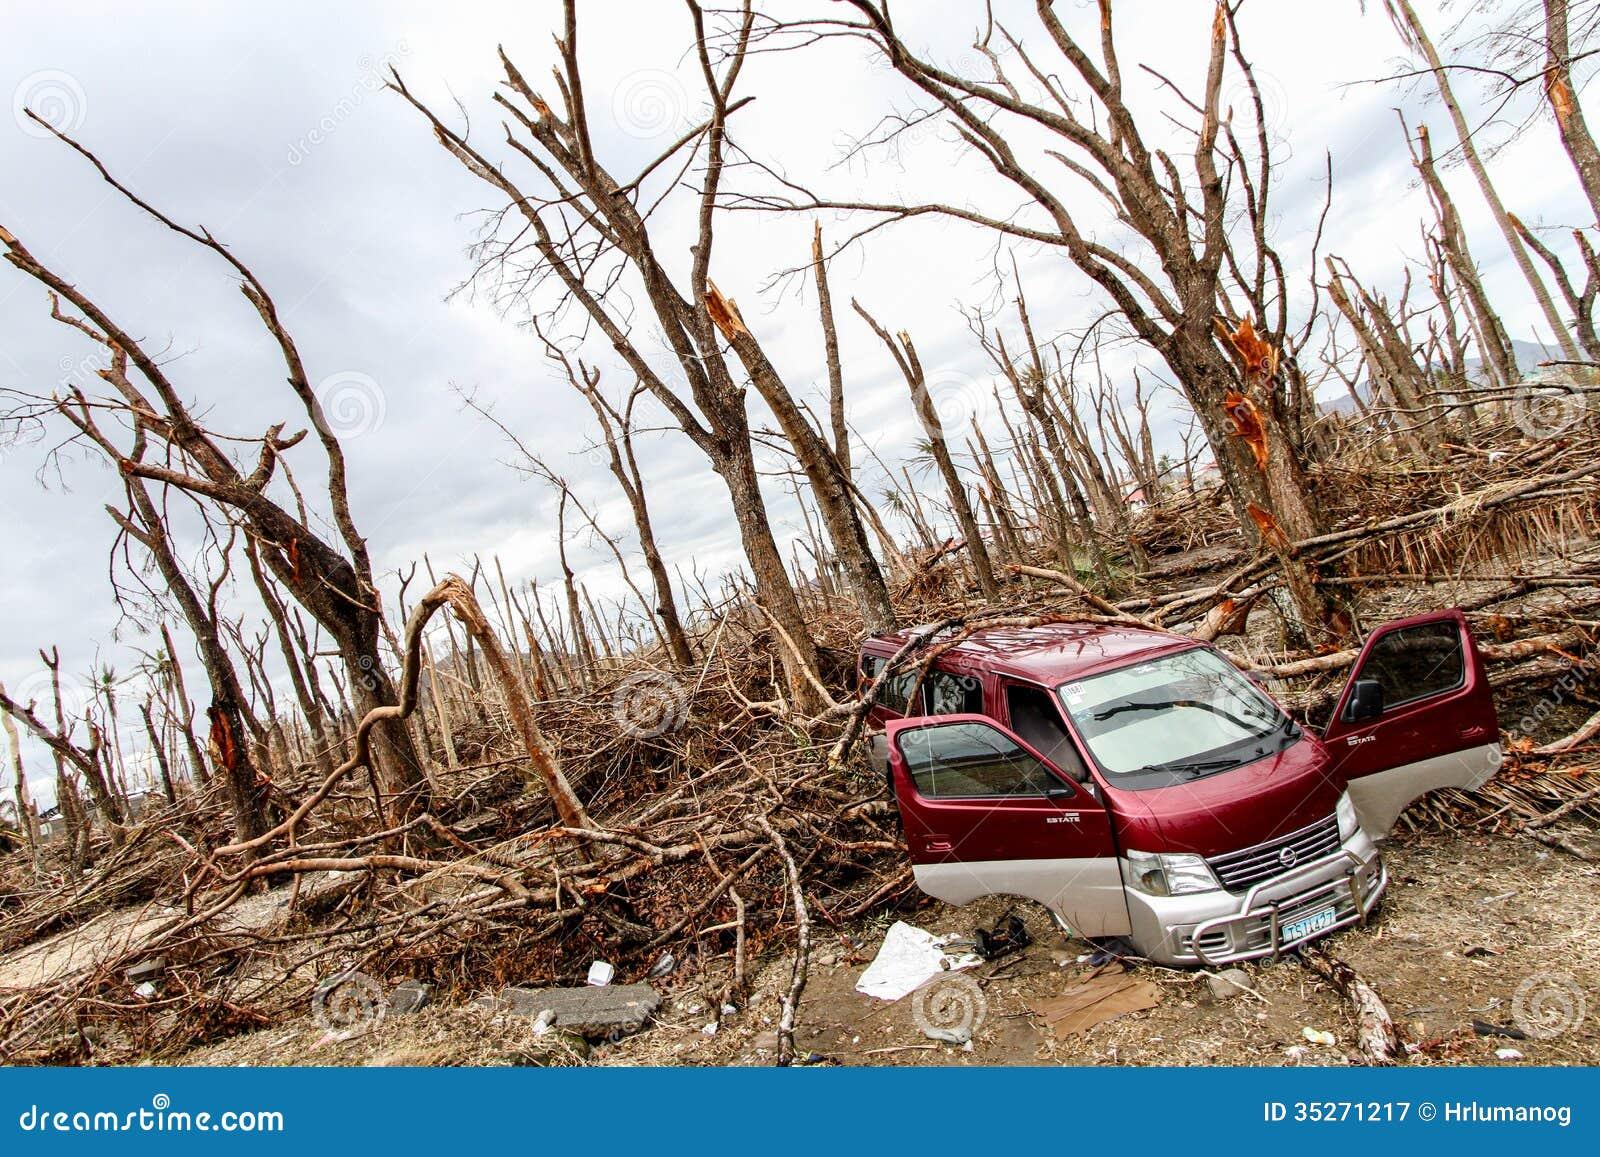 devastation-typhoon-haiyan-palo-leyte-november-remains-palo-catholic-church-devastated-yolanda-philippines-35271217.jpg